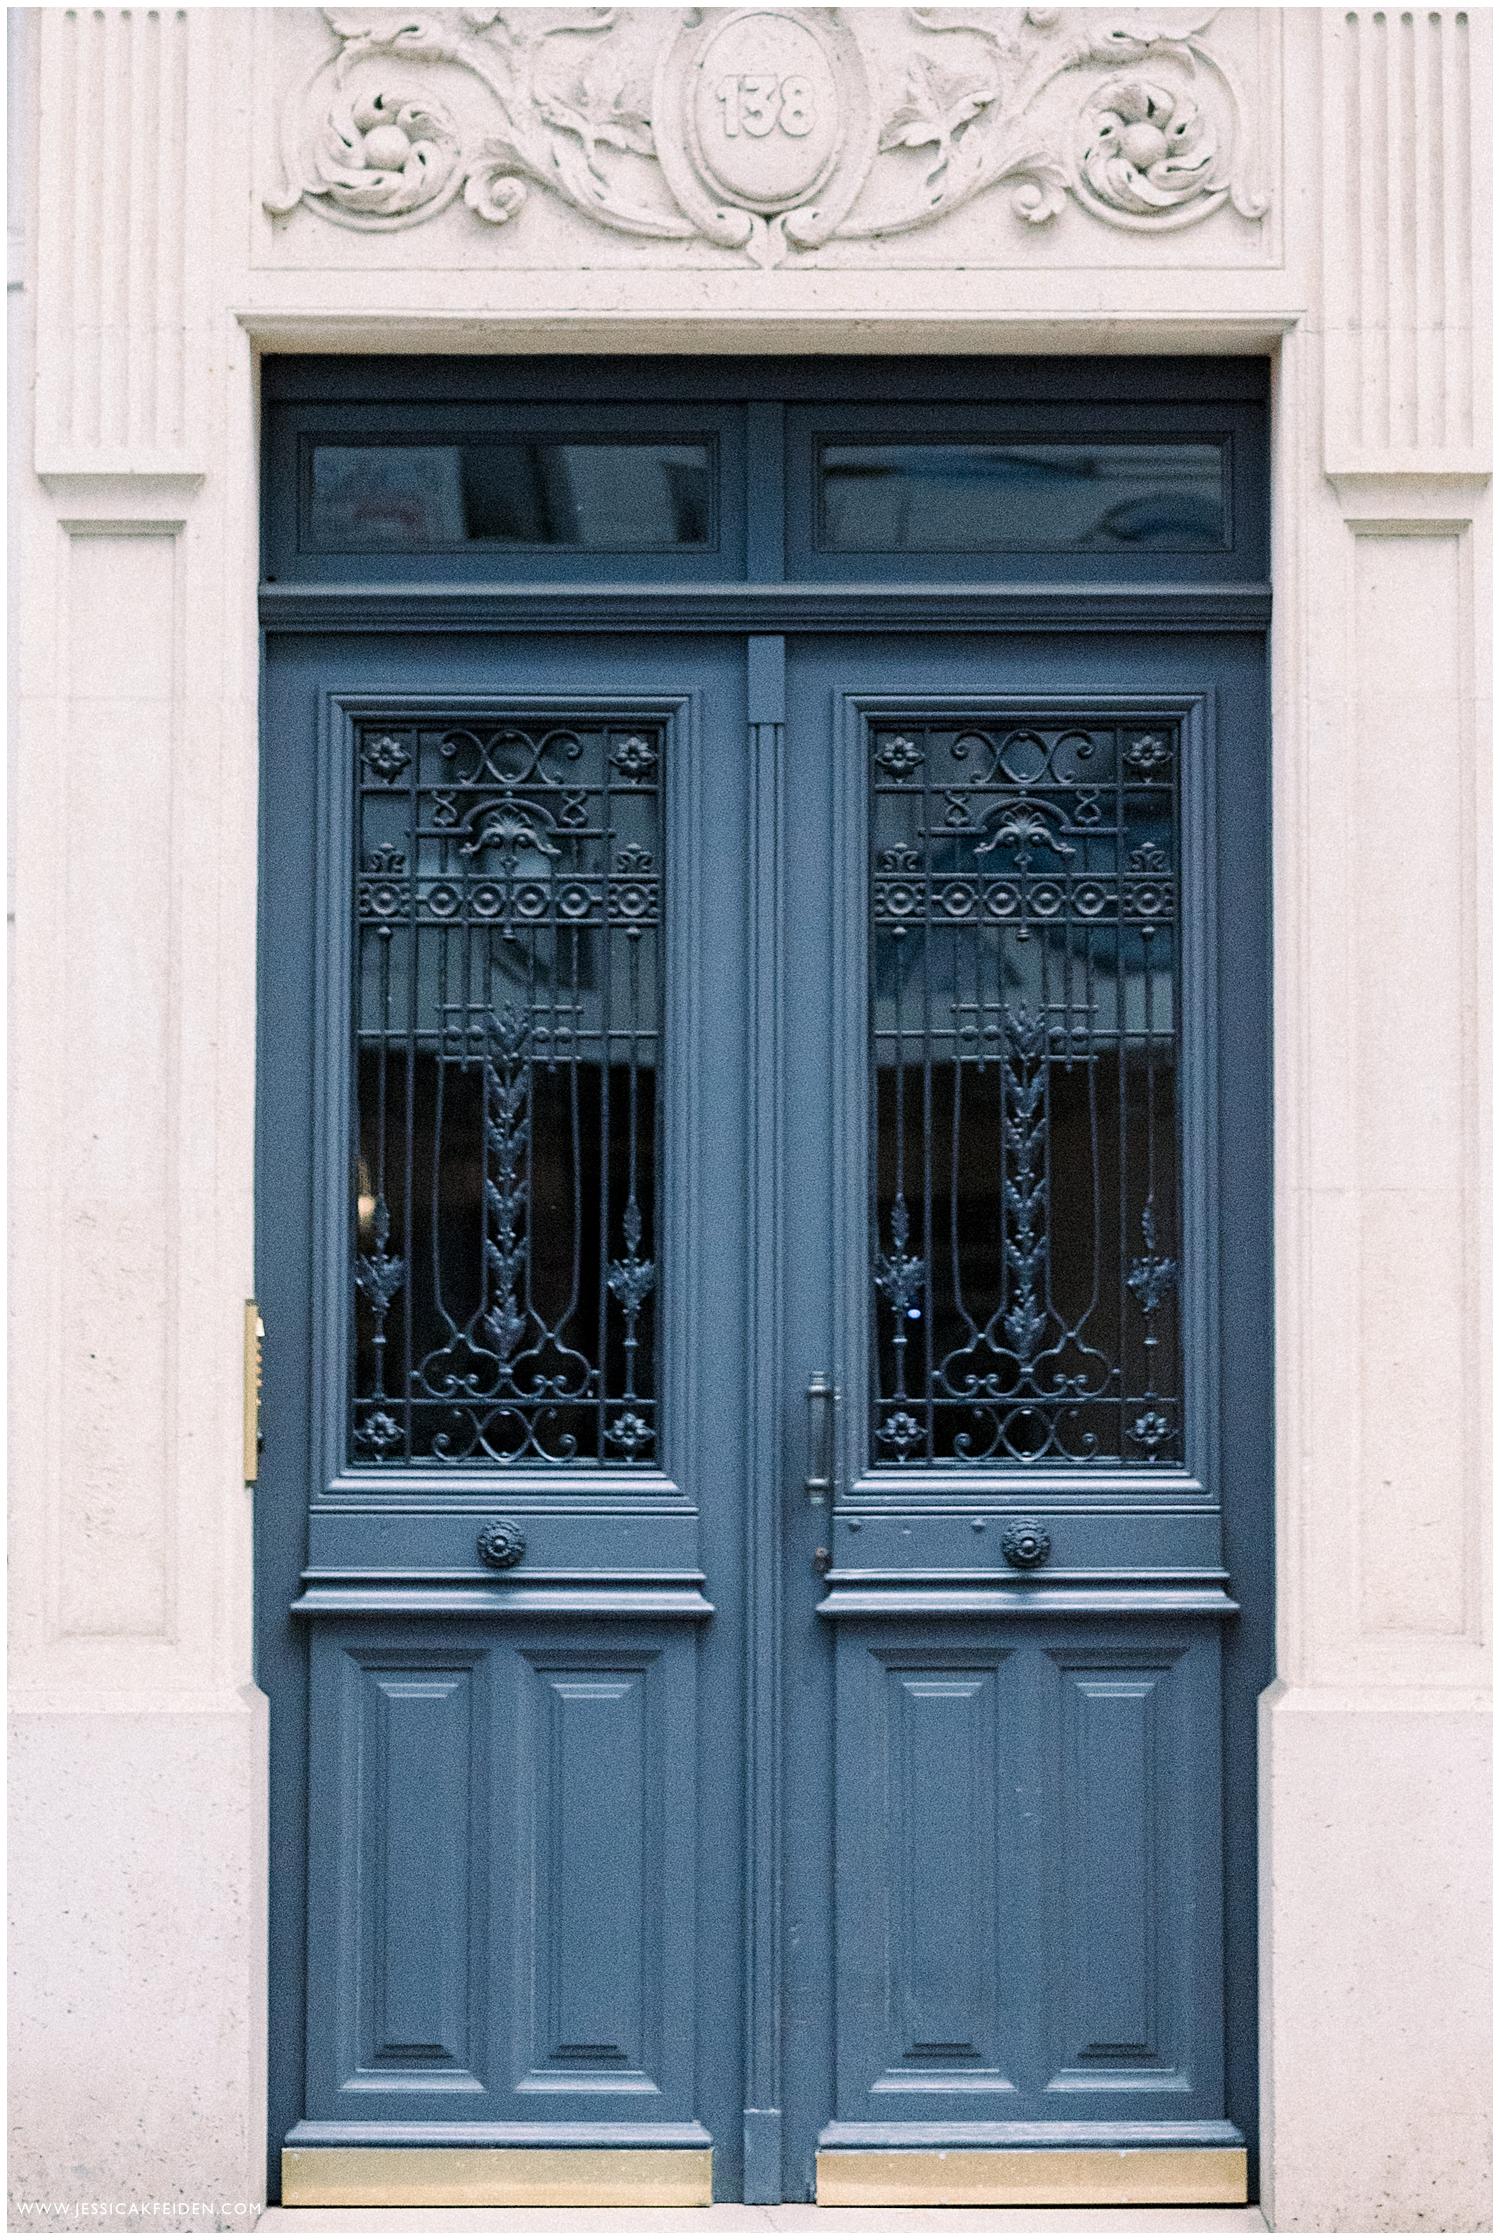 Jessica K Feiden Photography_Paris in November- Destination Paris Photographer_0002.jpg